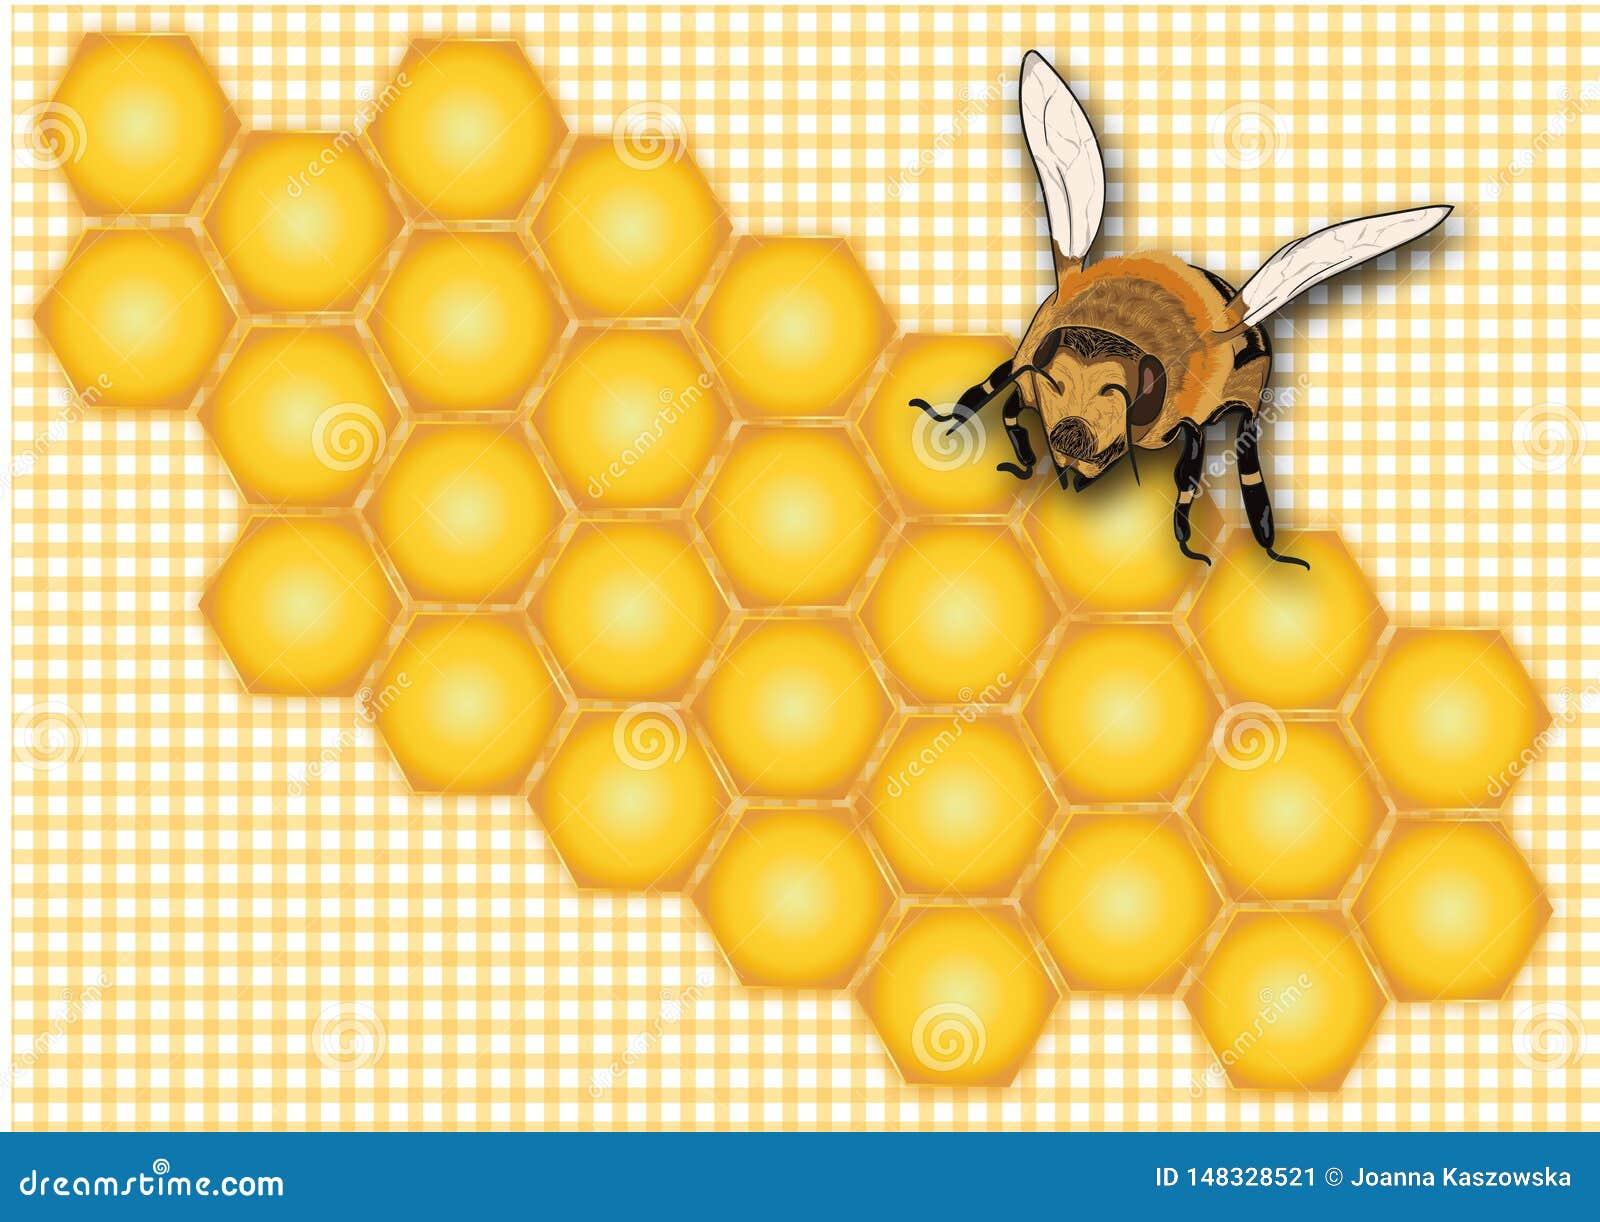 Мед, сот, ярлык меда, ярлык опарника меда, лето, насекомое, желтая пчела, помадка, предпосылка меда,